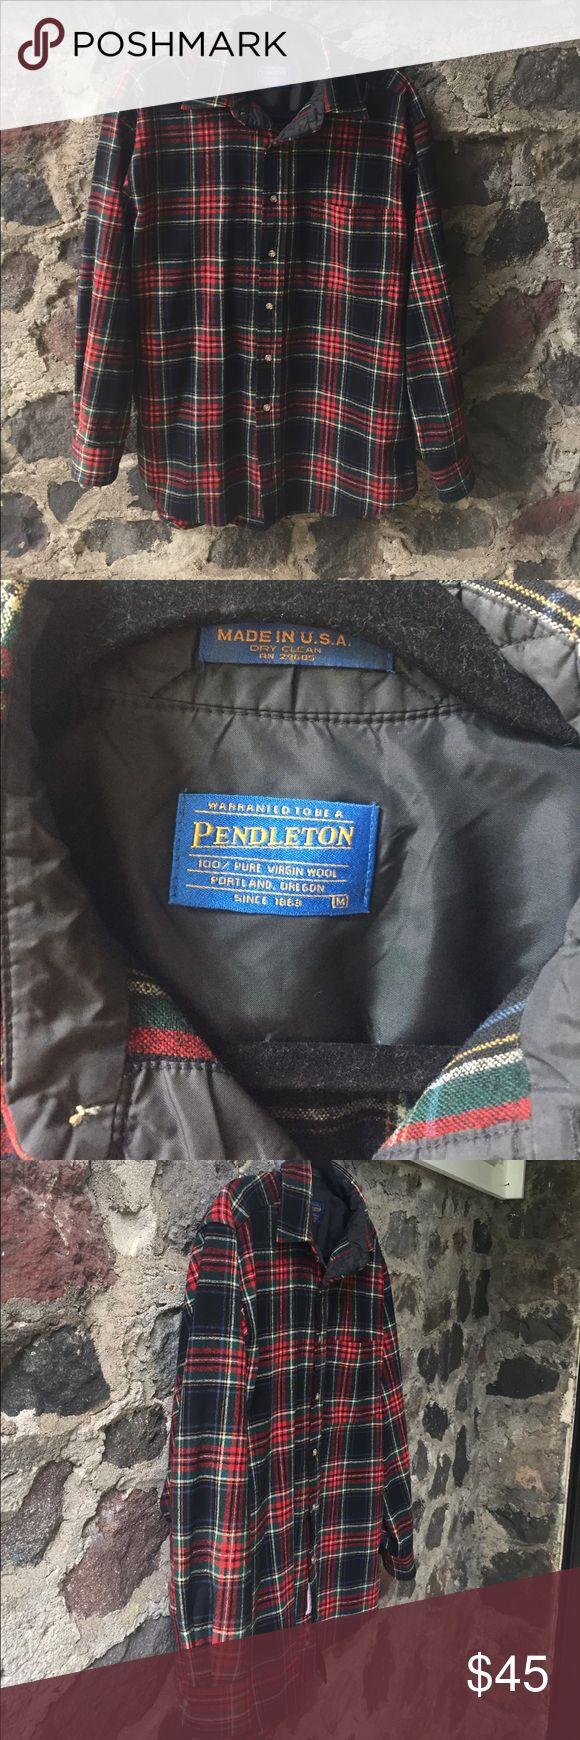 "NWOT Pendleton Black Stewart Tartan Shirt size M NWOT.. in perfect condition! Size M. Measurements are as follows: 28.5"" length, 22"" armpit to armpit, 22"" sleeve. Pendleton Shirts Casual Button Down Shirts"